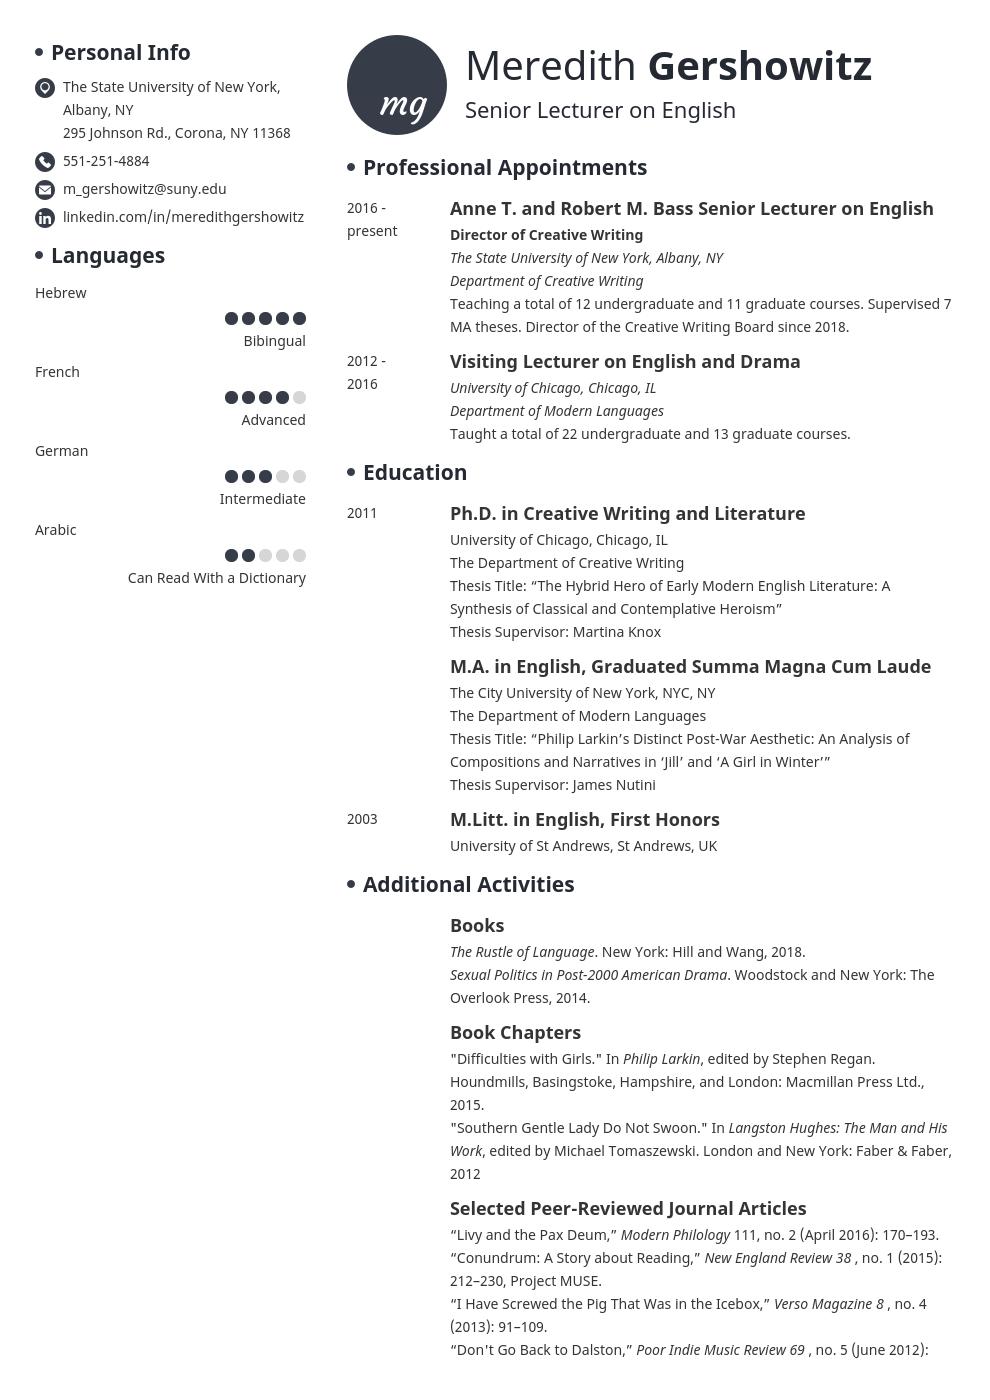 cv academic template initials